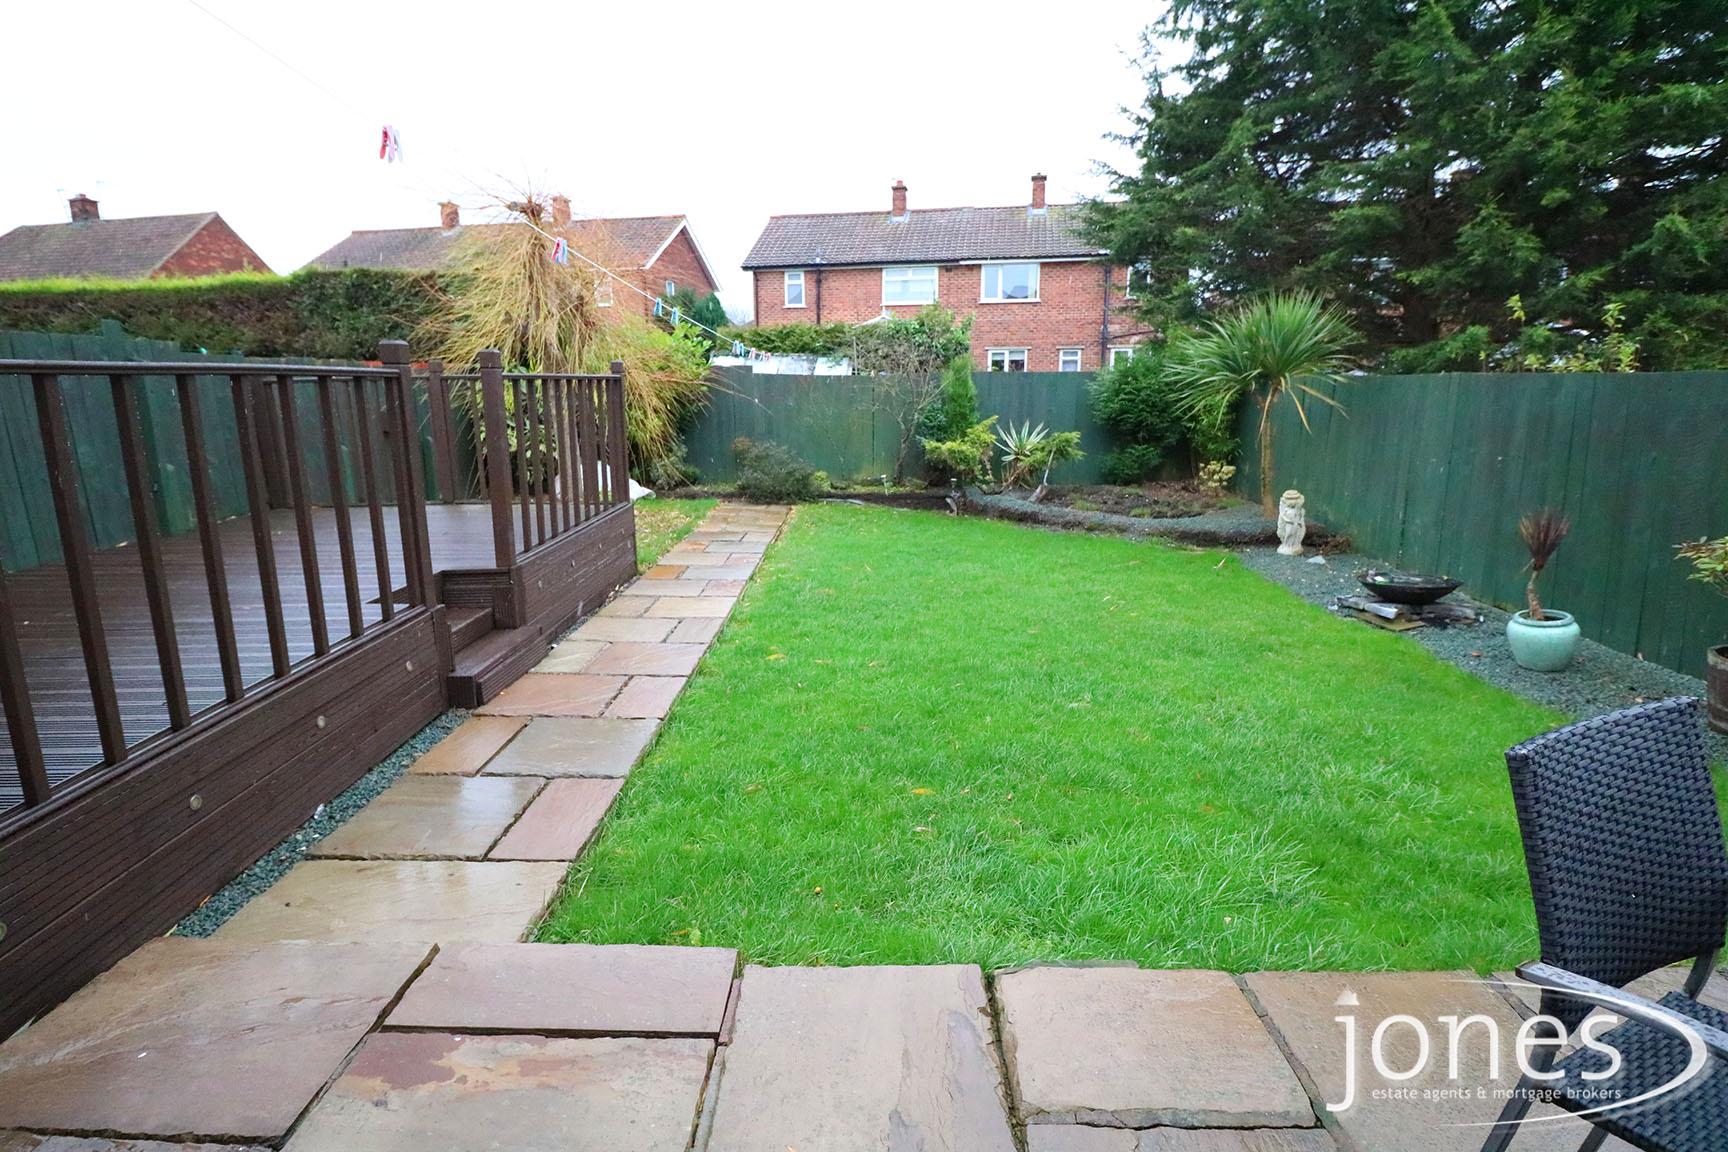 Home for Sale Let - Photo 12 Feetham Avenue, Darlington, DL1 2DY